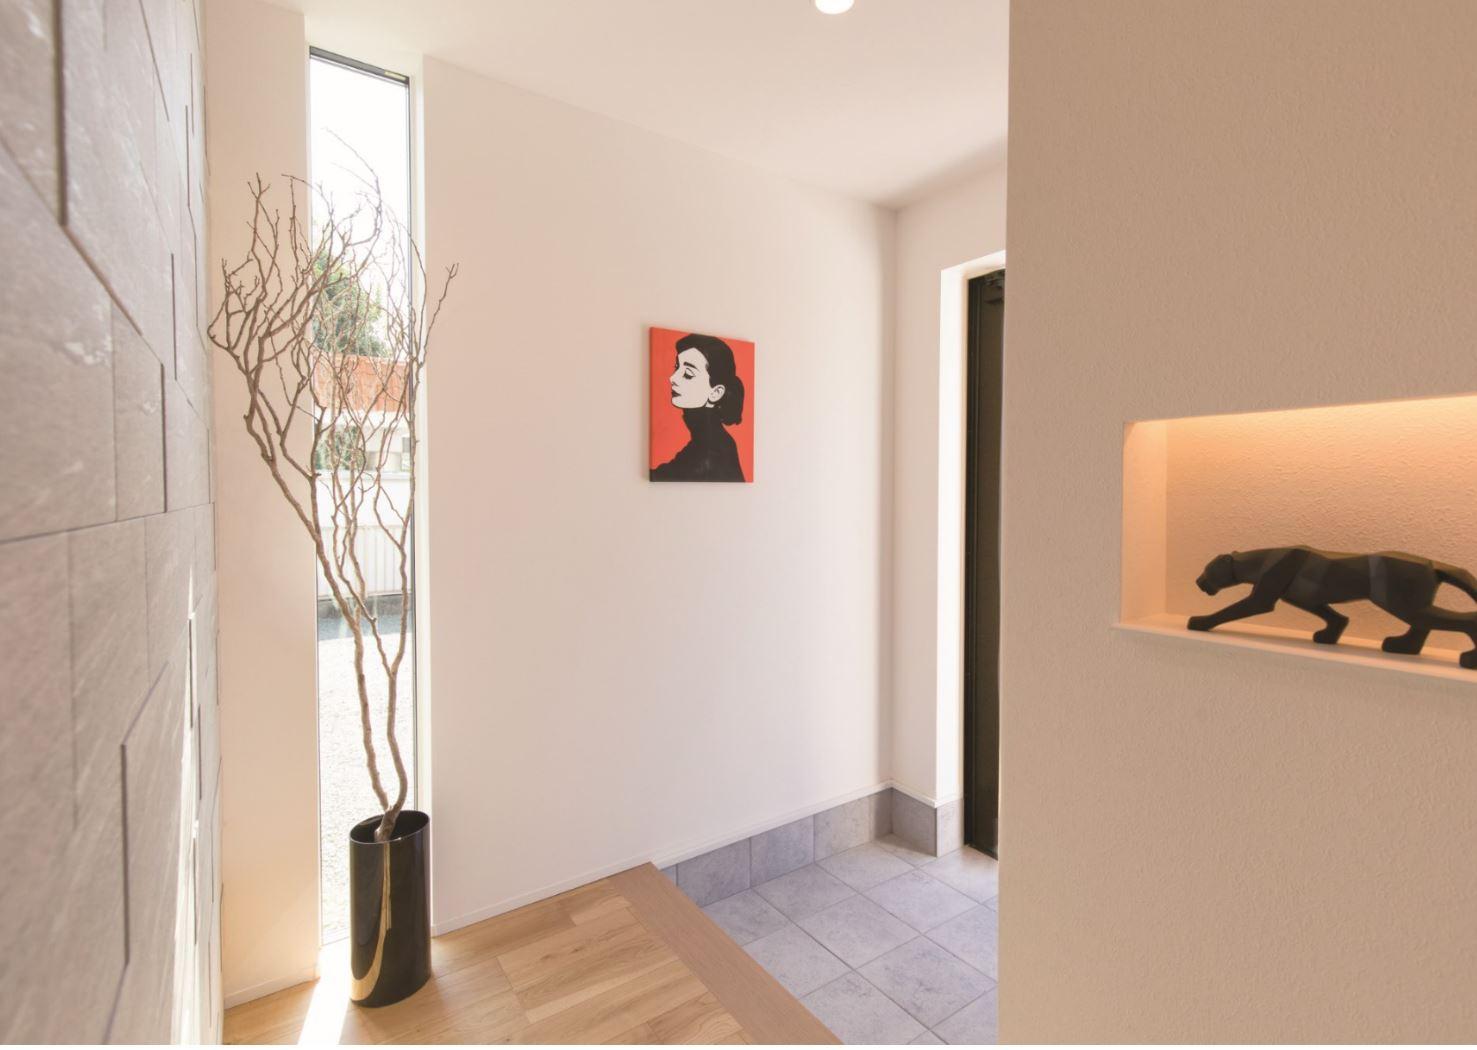 REIWA HOUSE(令和ハウス)【浜松市中区葵西2-18-21・モデルハウス】玄関はタイル調の壁でシックな雰囲気に